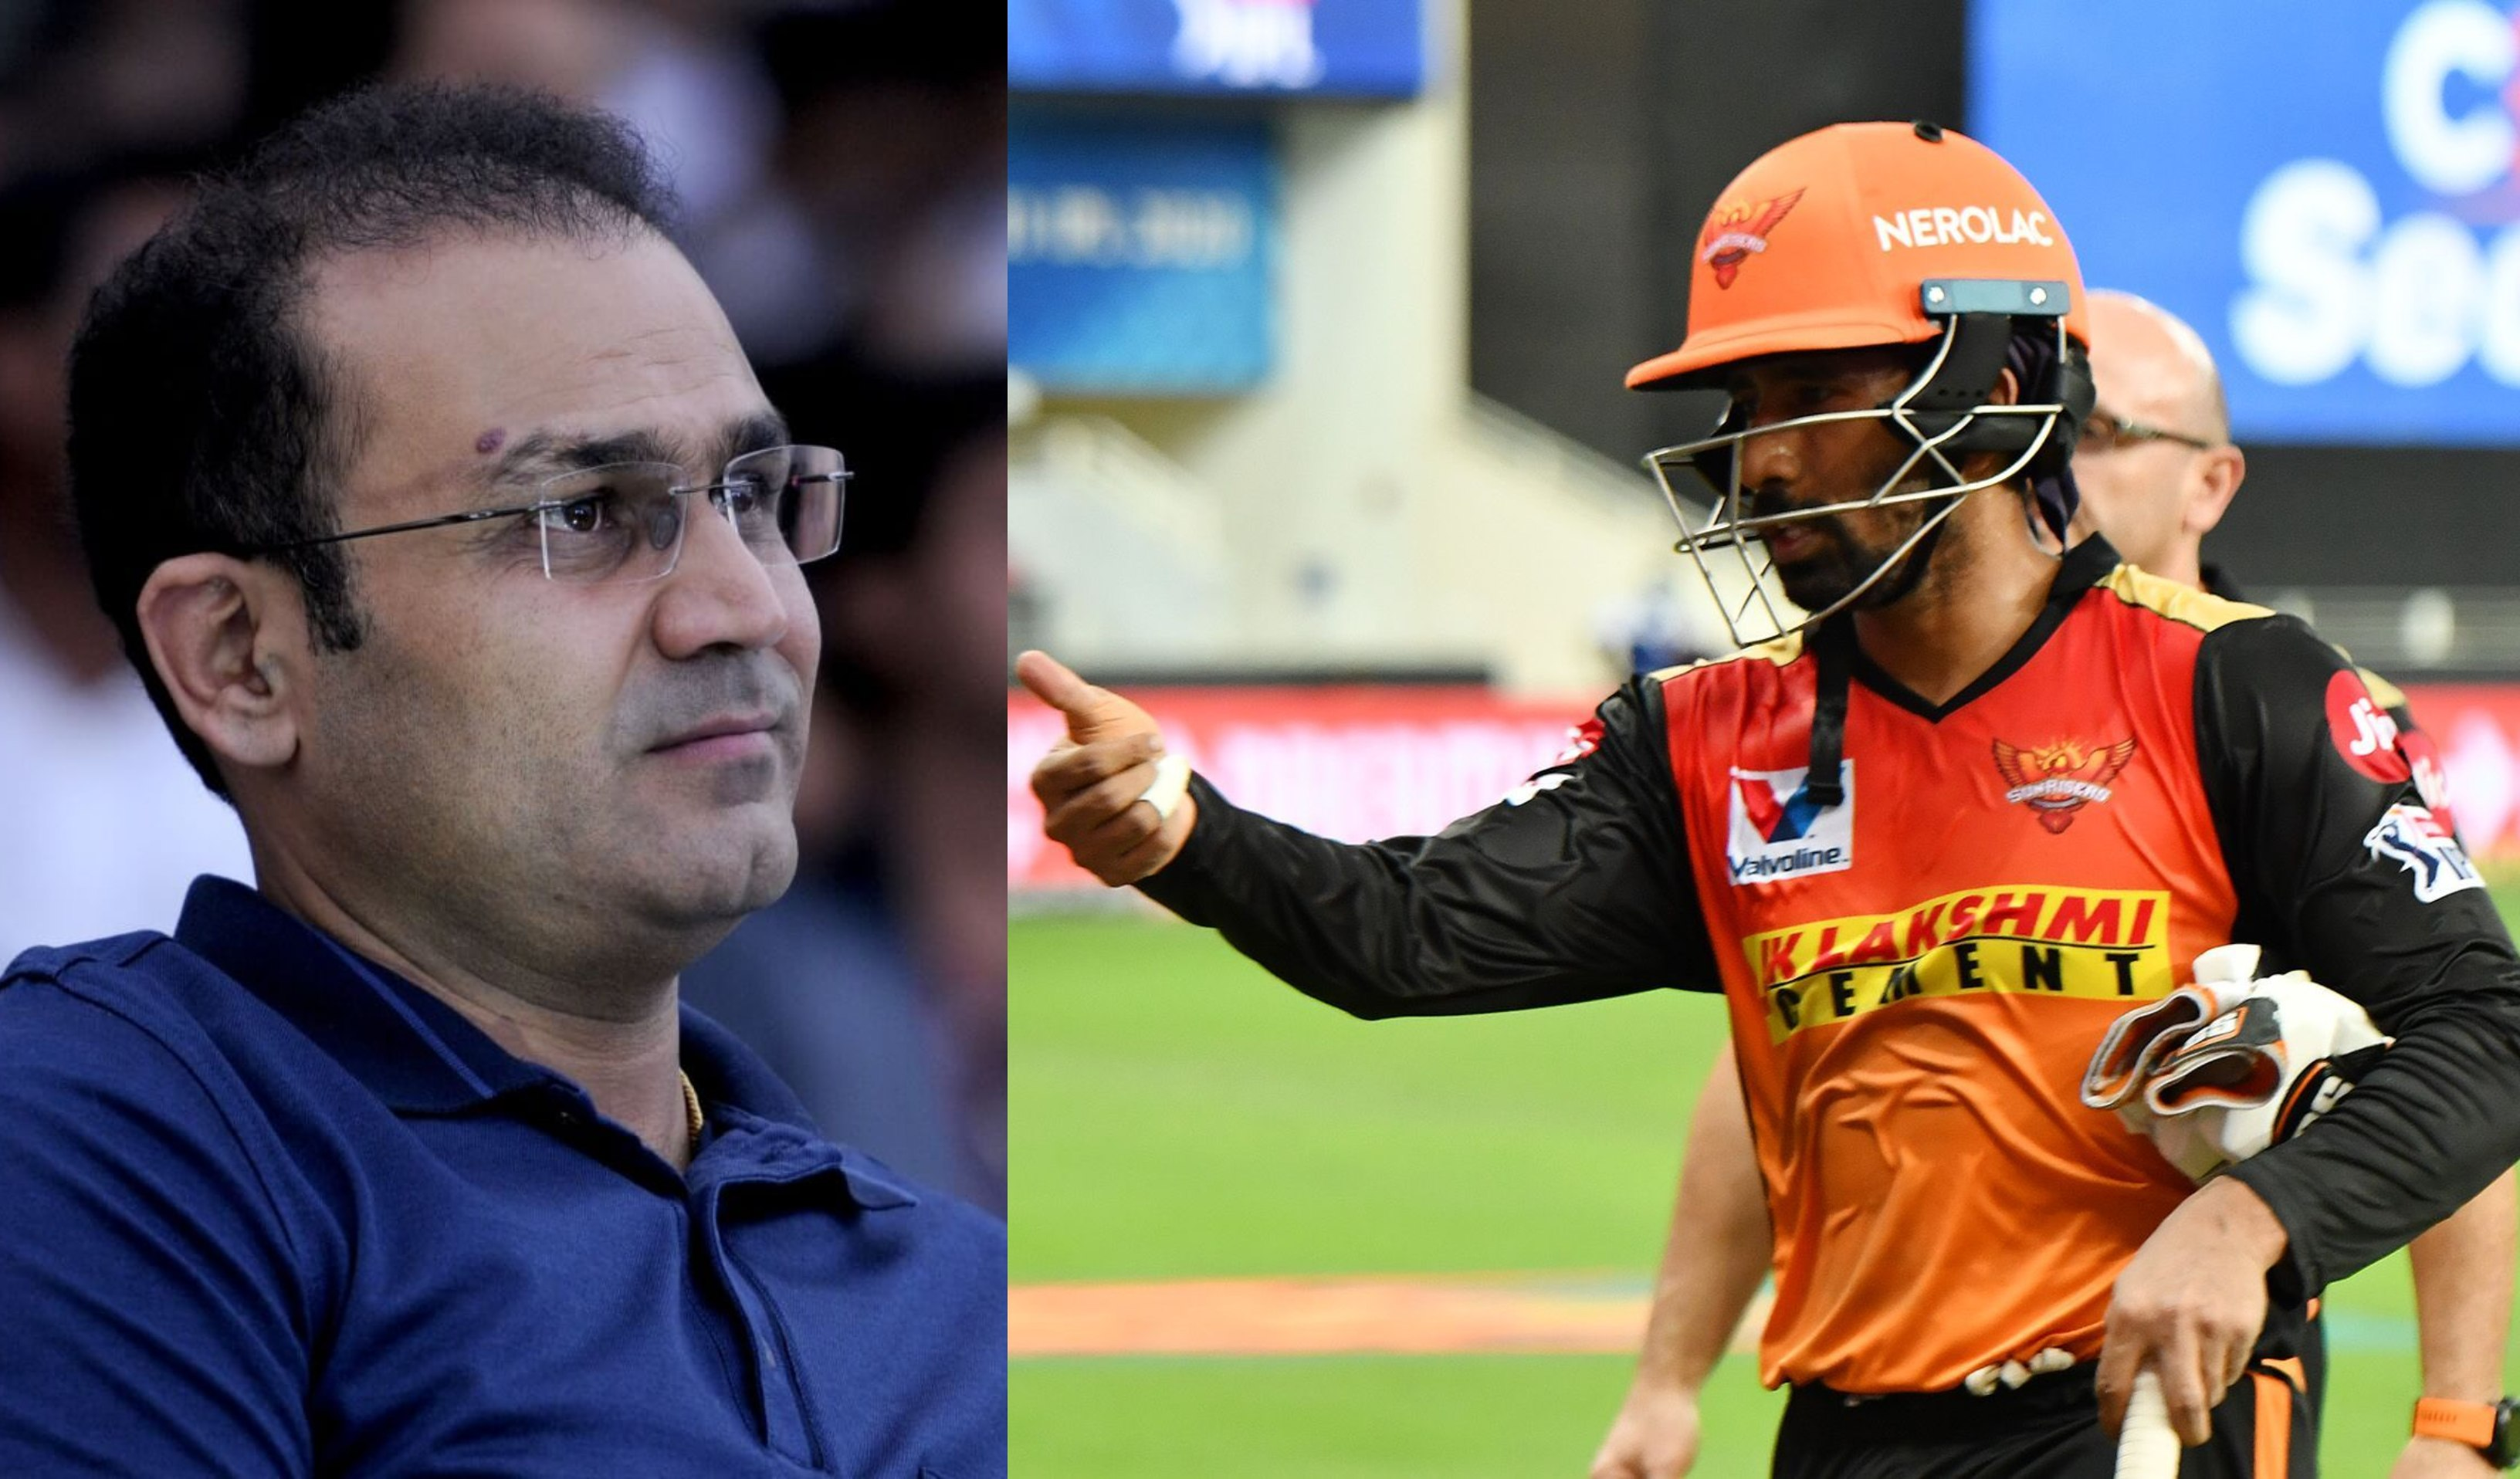 Virender Sehwag says srh batsman Wriddhiman Saha is not considered dangerous batsman due to his repu